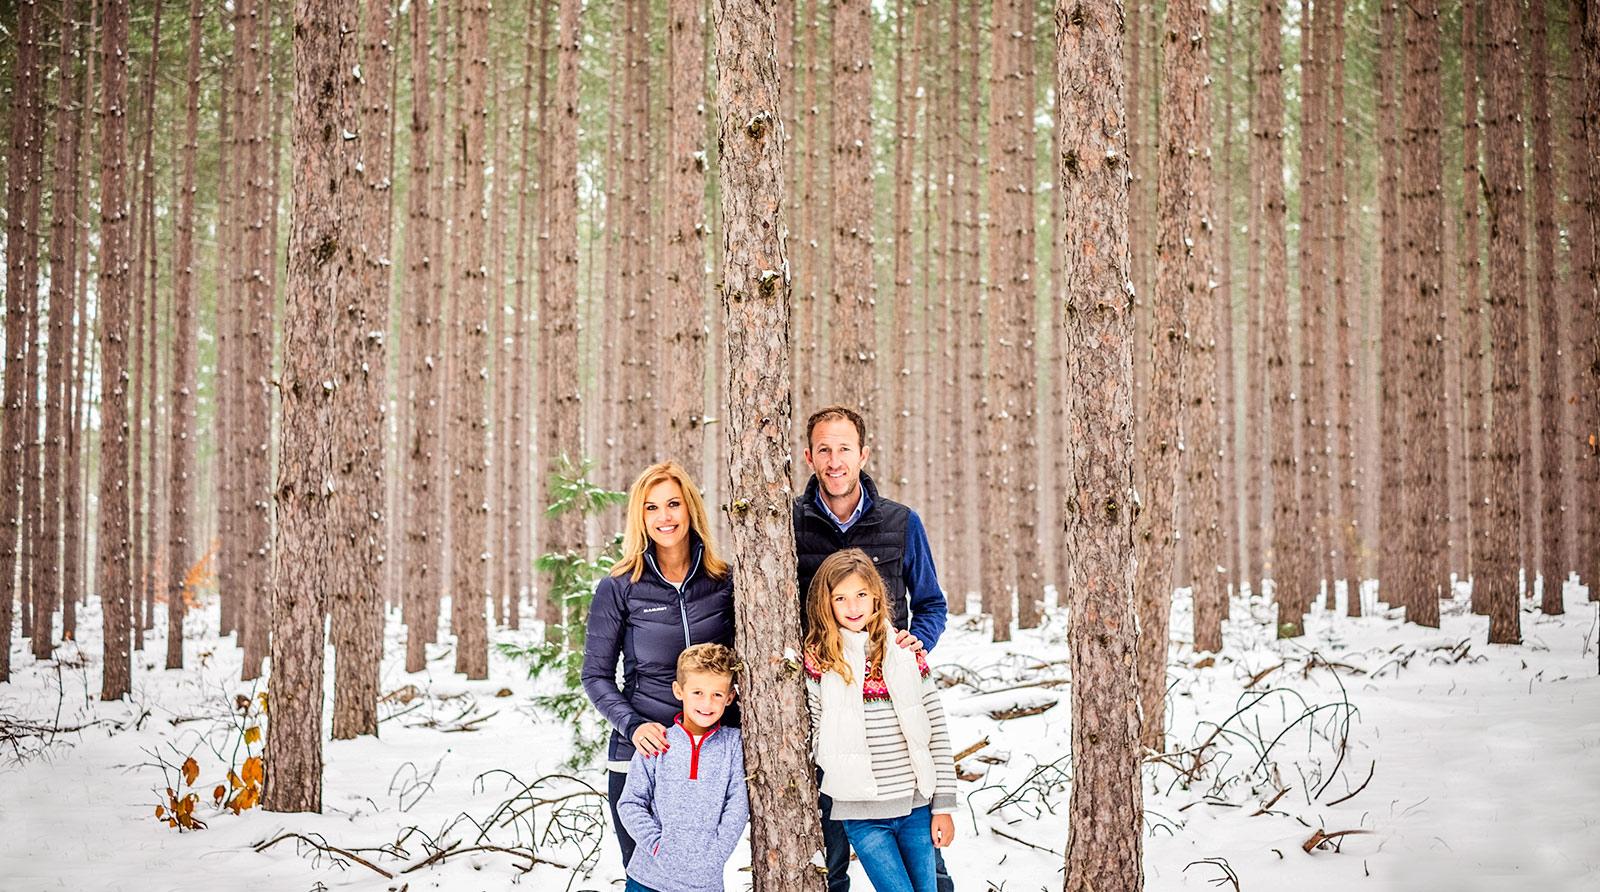 A Winter Family Portrait Session